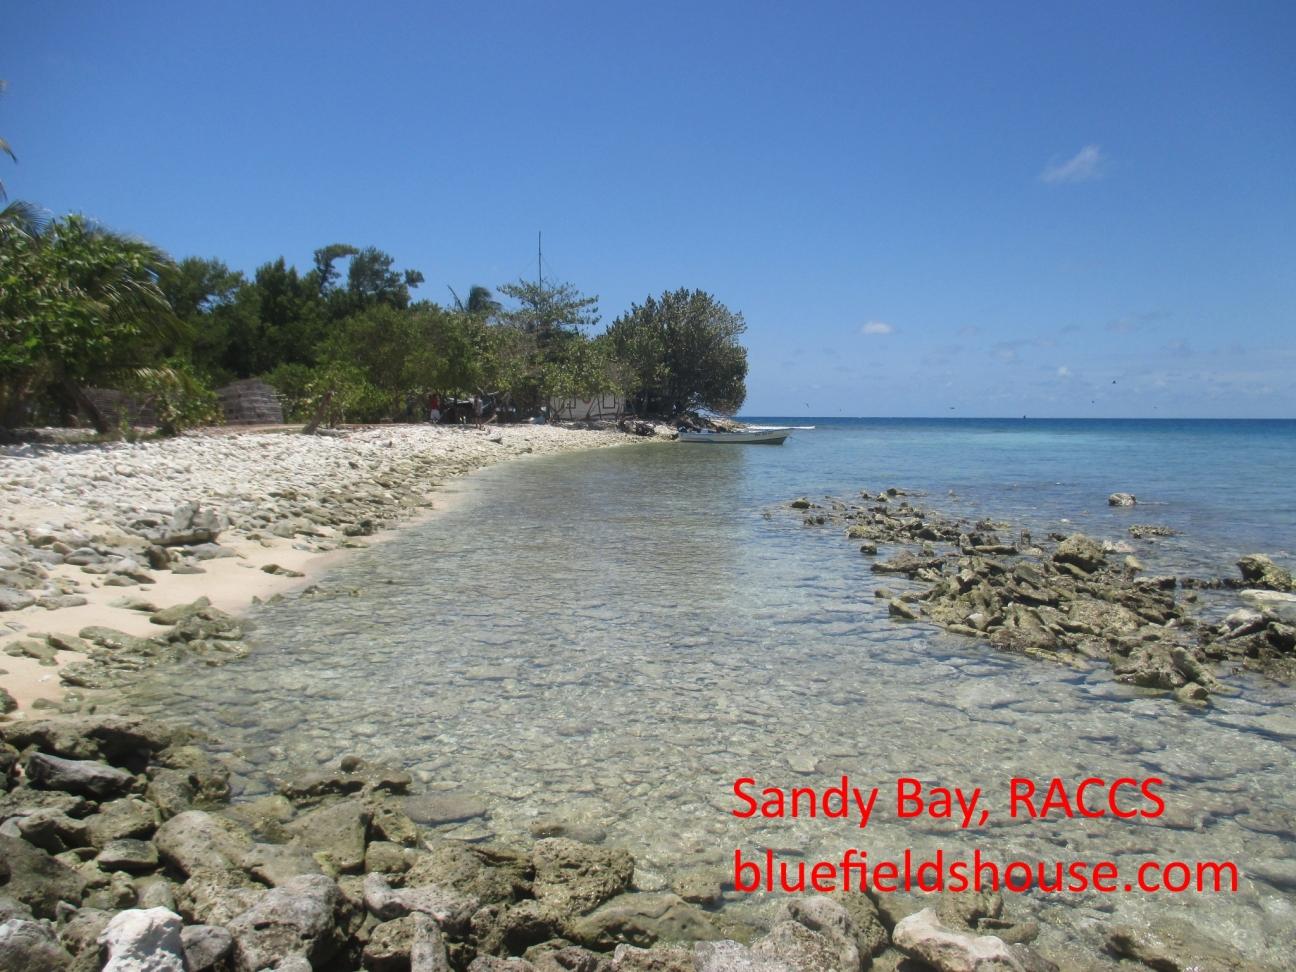 cayos-sandy-bay-2